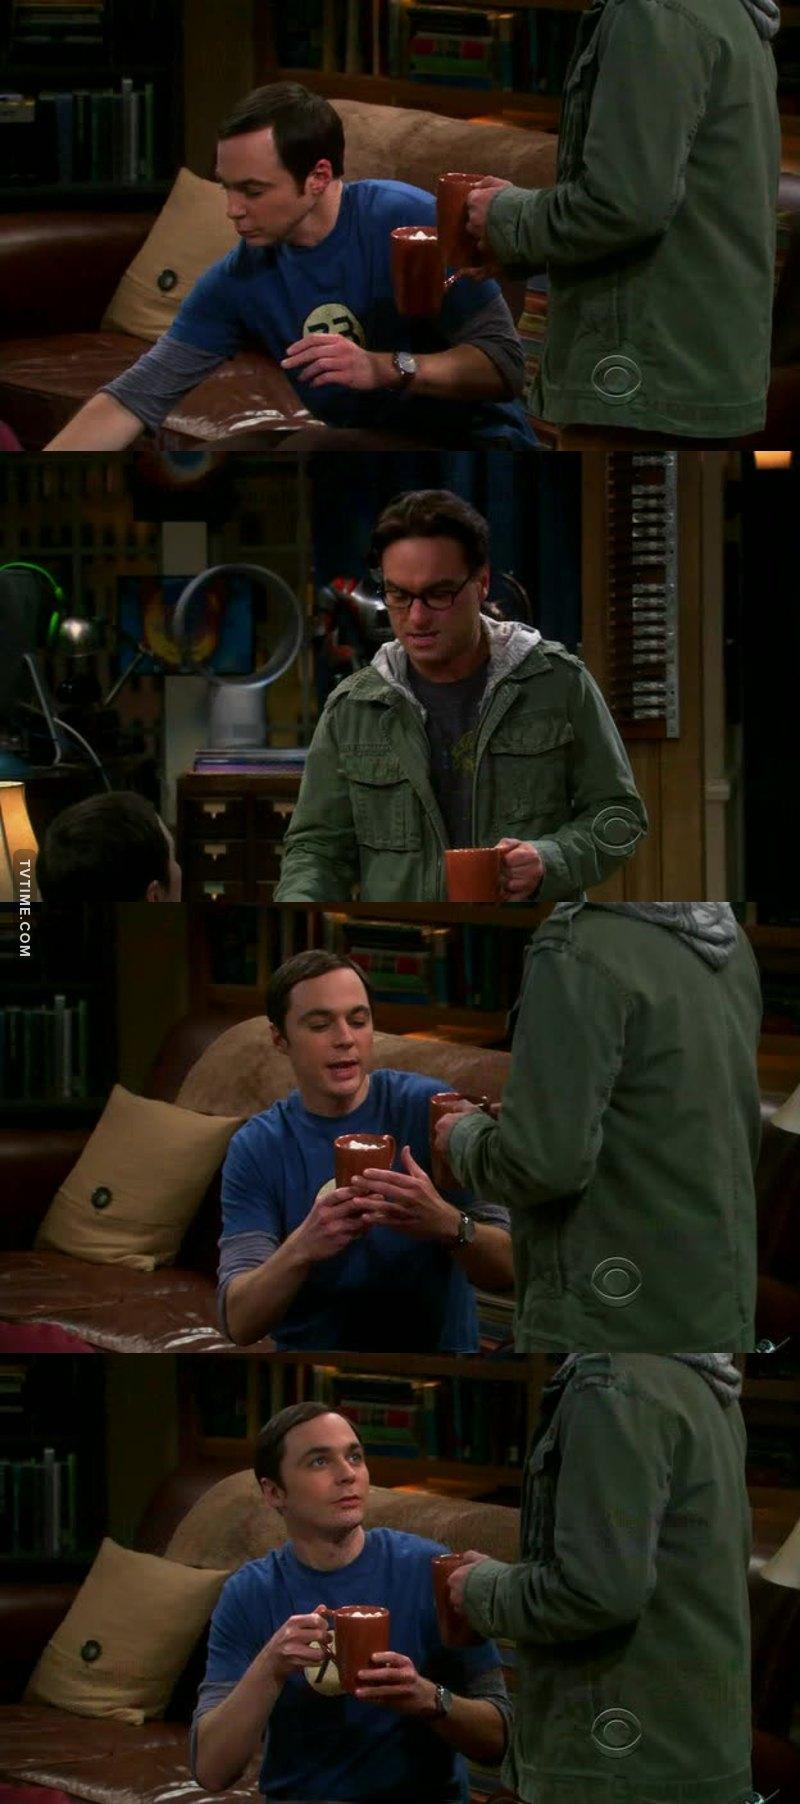 Sheldon! 😂😂😂